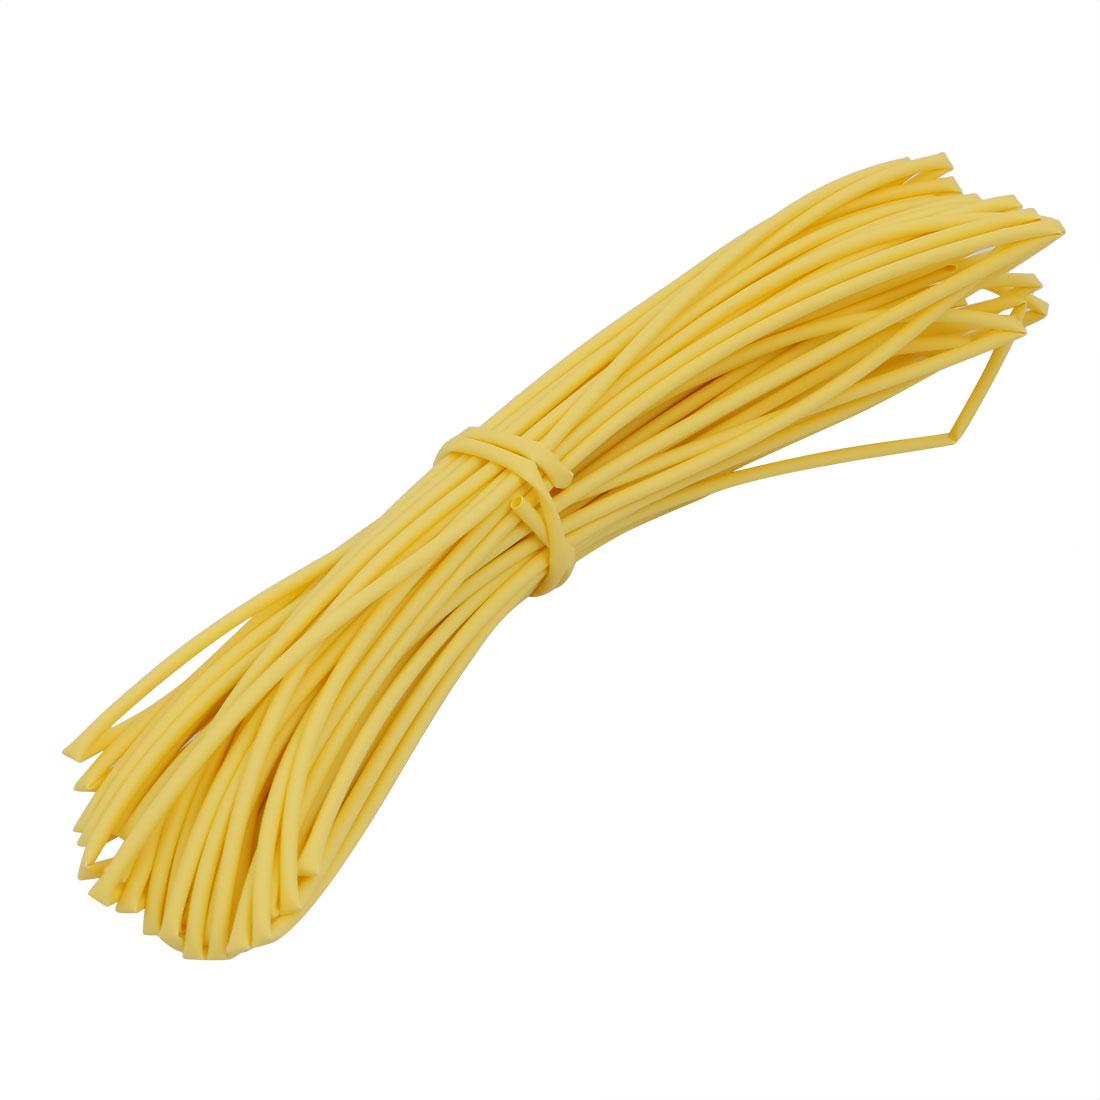 15M 0.06in Inner Dia Polyolefin Flame Retardant Tube Yellow for Wire Repairing